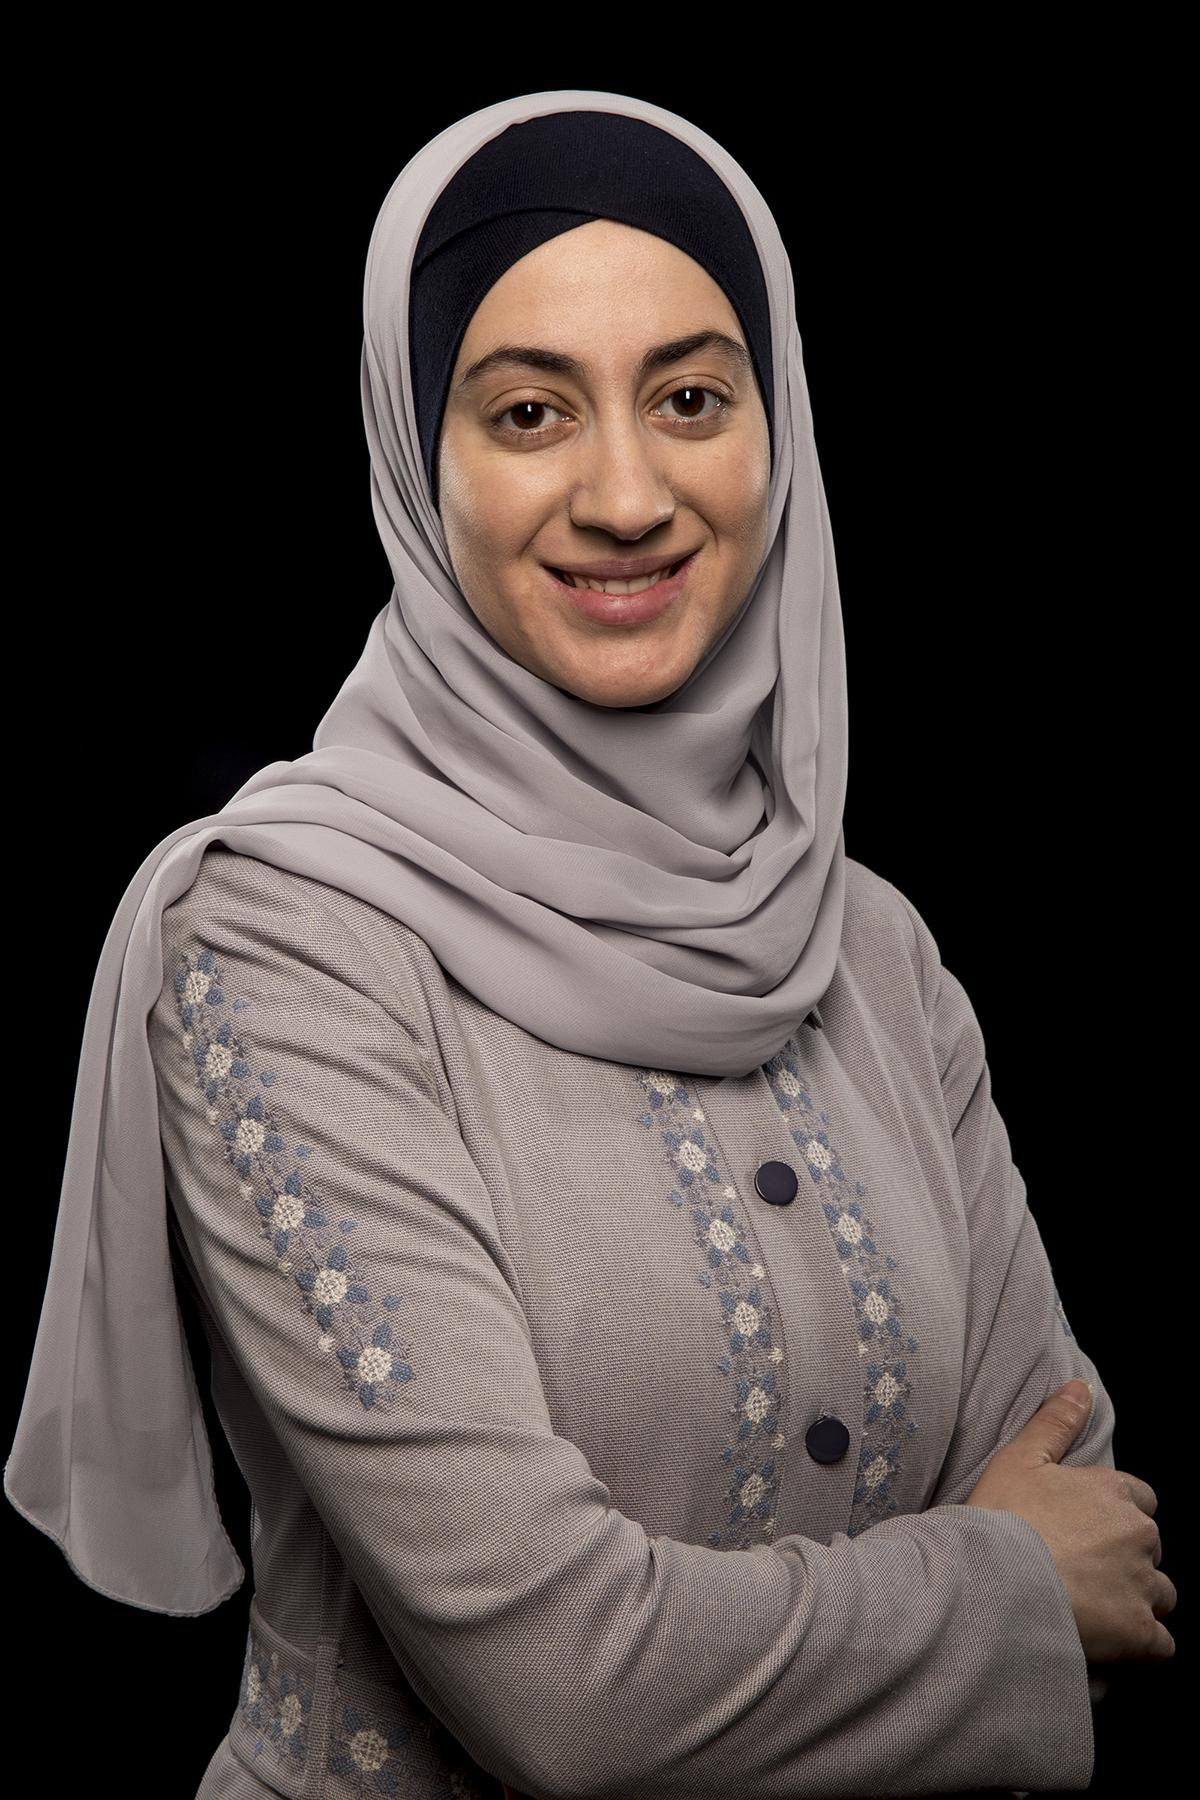 Dr. Joman Natsheh